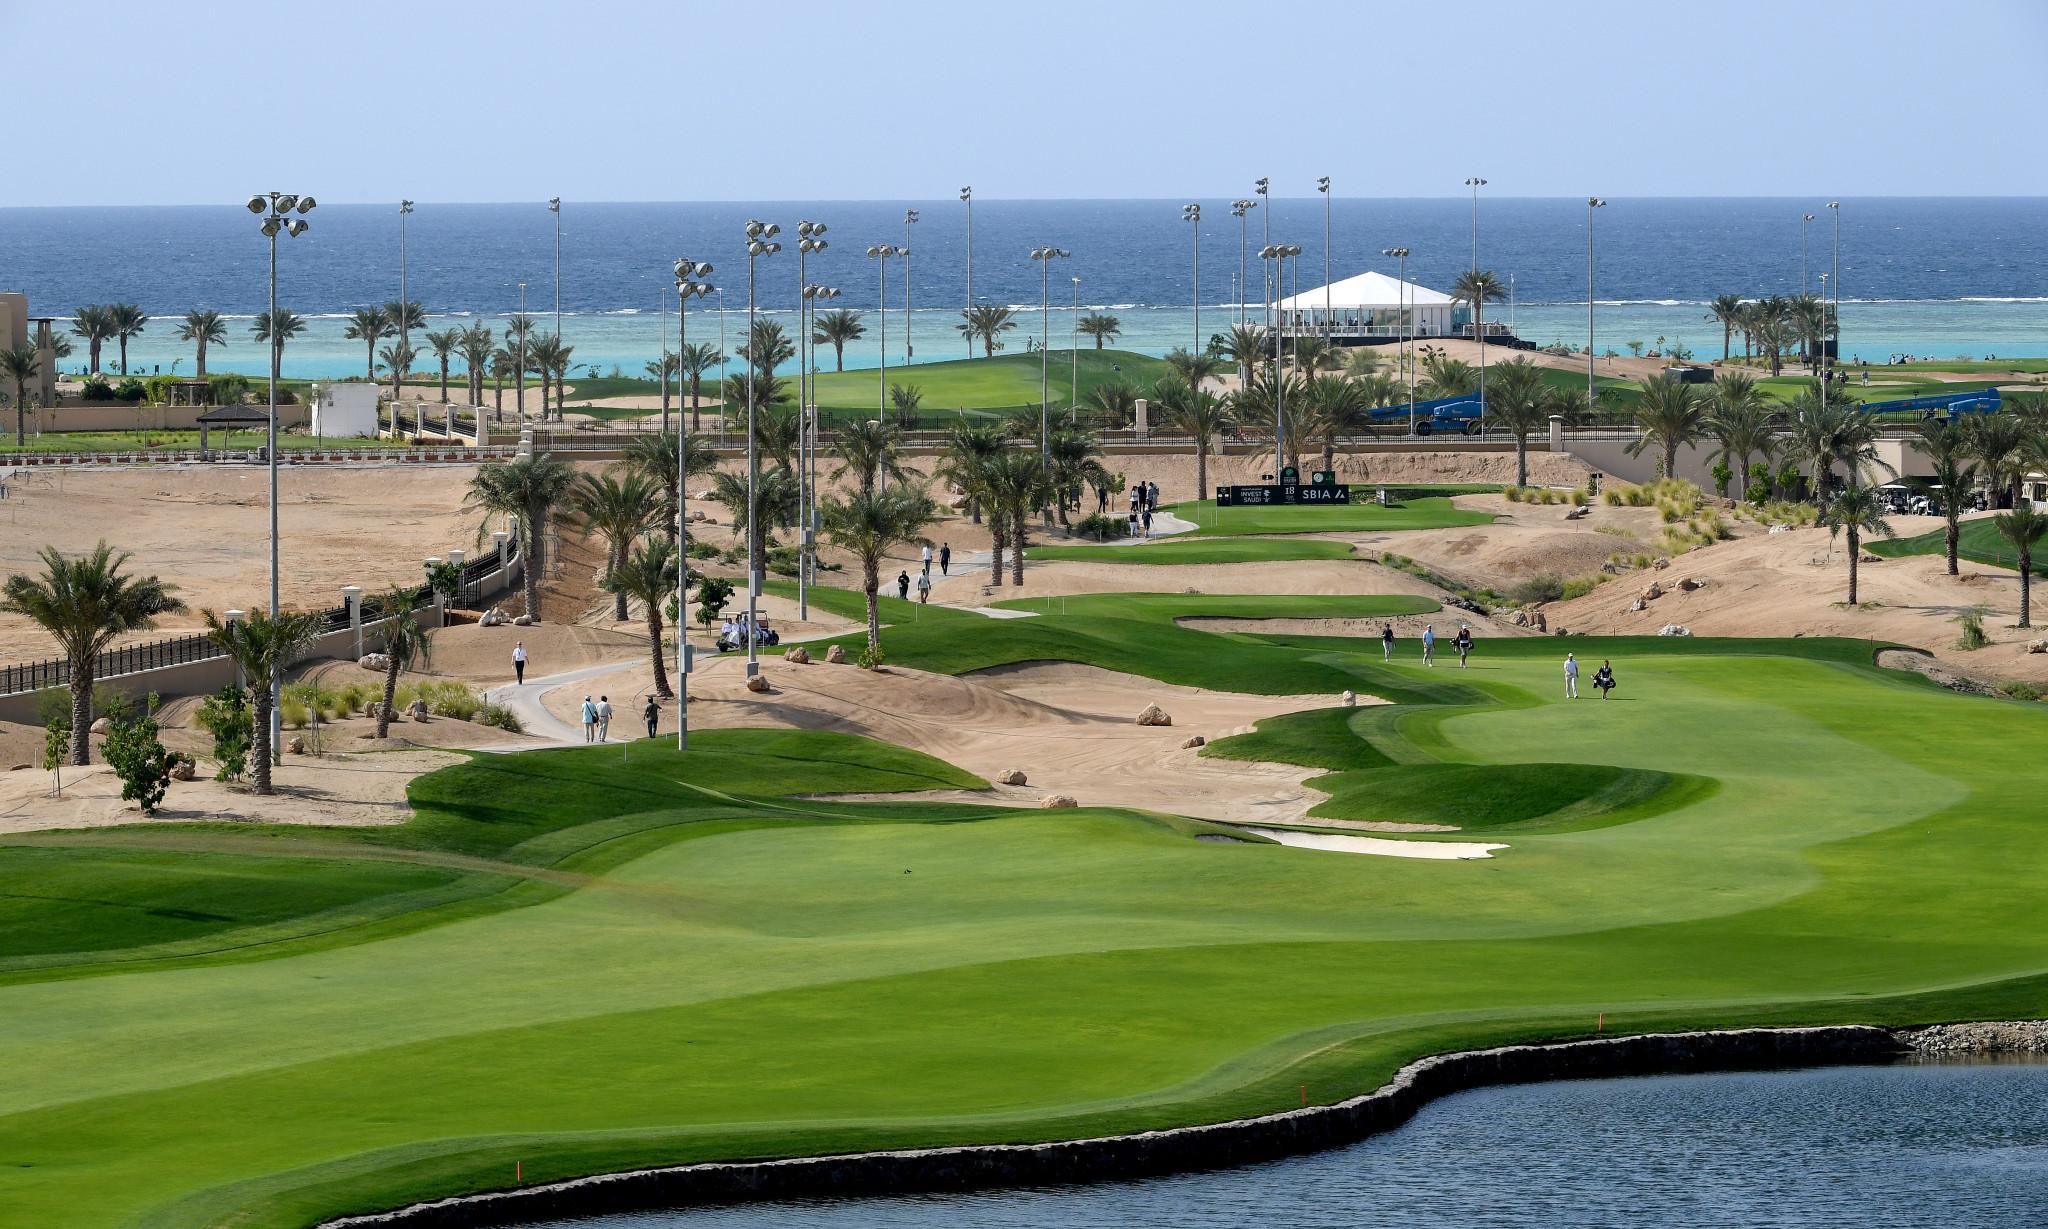 Saudi Arabia named among venues for new Ladies European Tour series